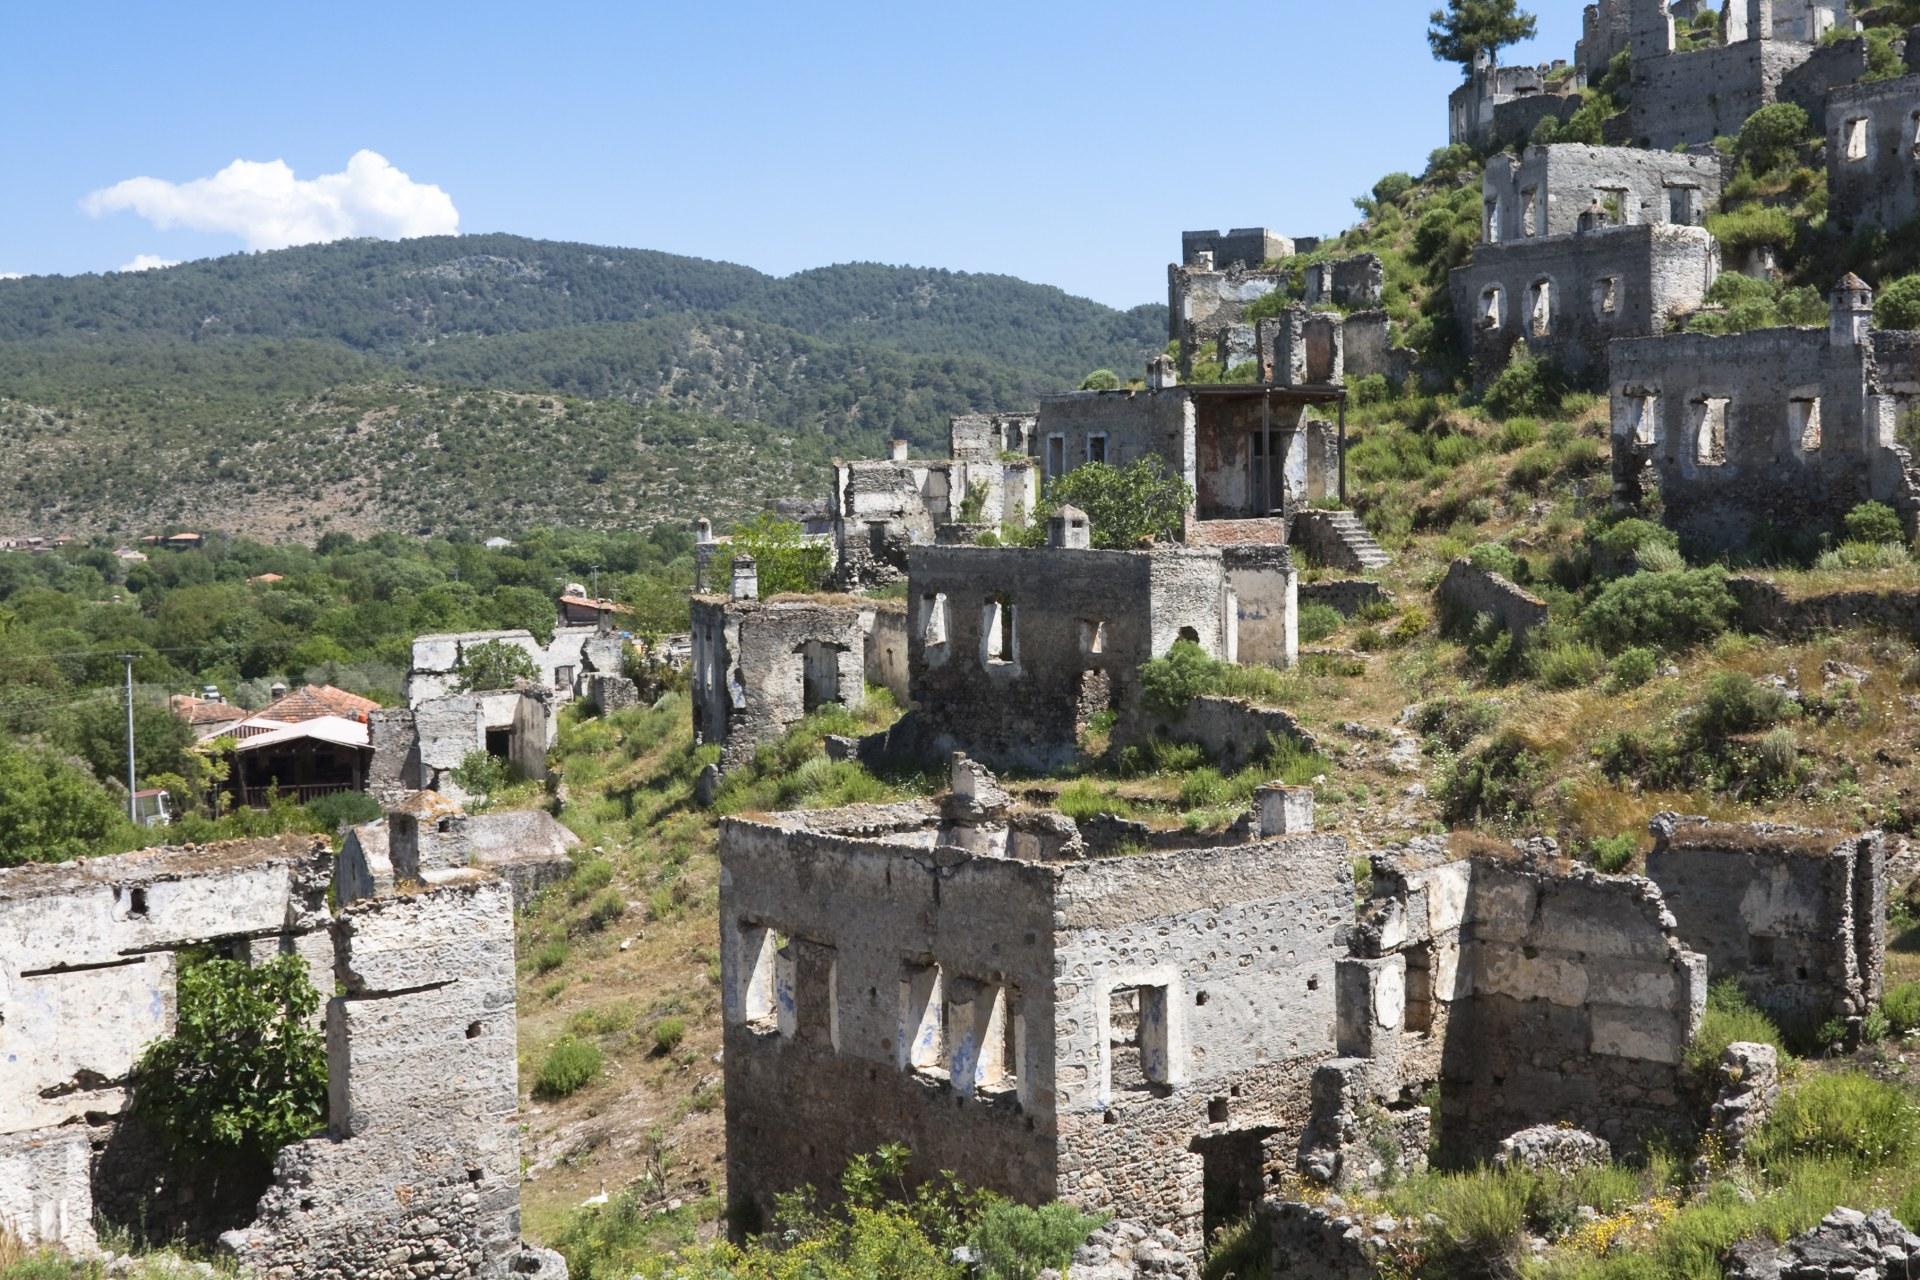 Ruiny w Kayakoy, Turcja